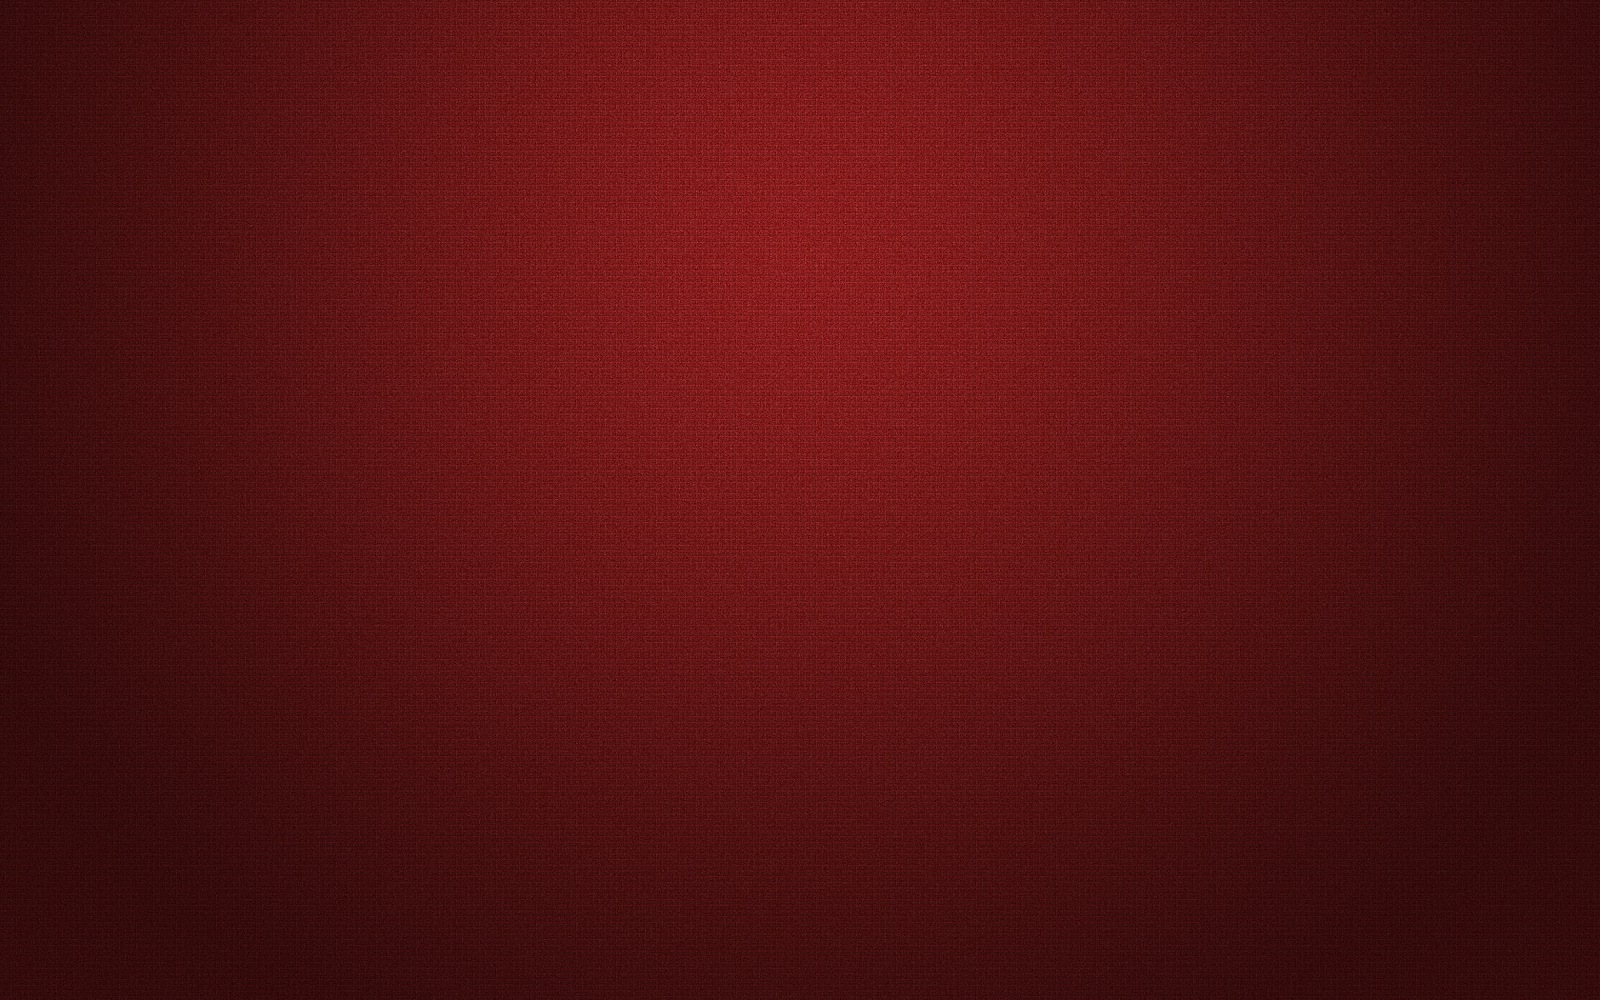 best top desktop red wallpapers red wallpaper red background hd 26jpg 1600x1000